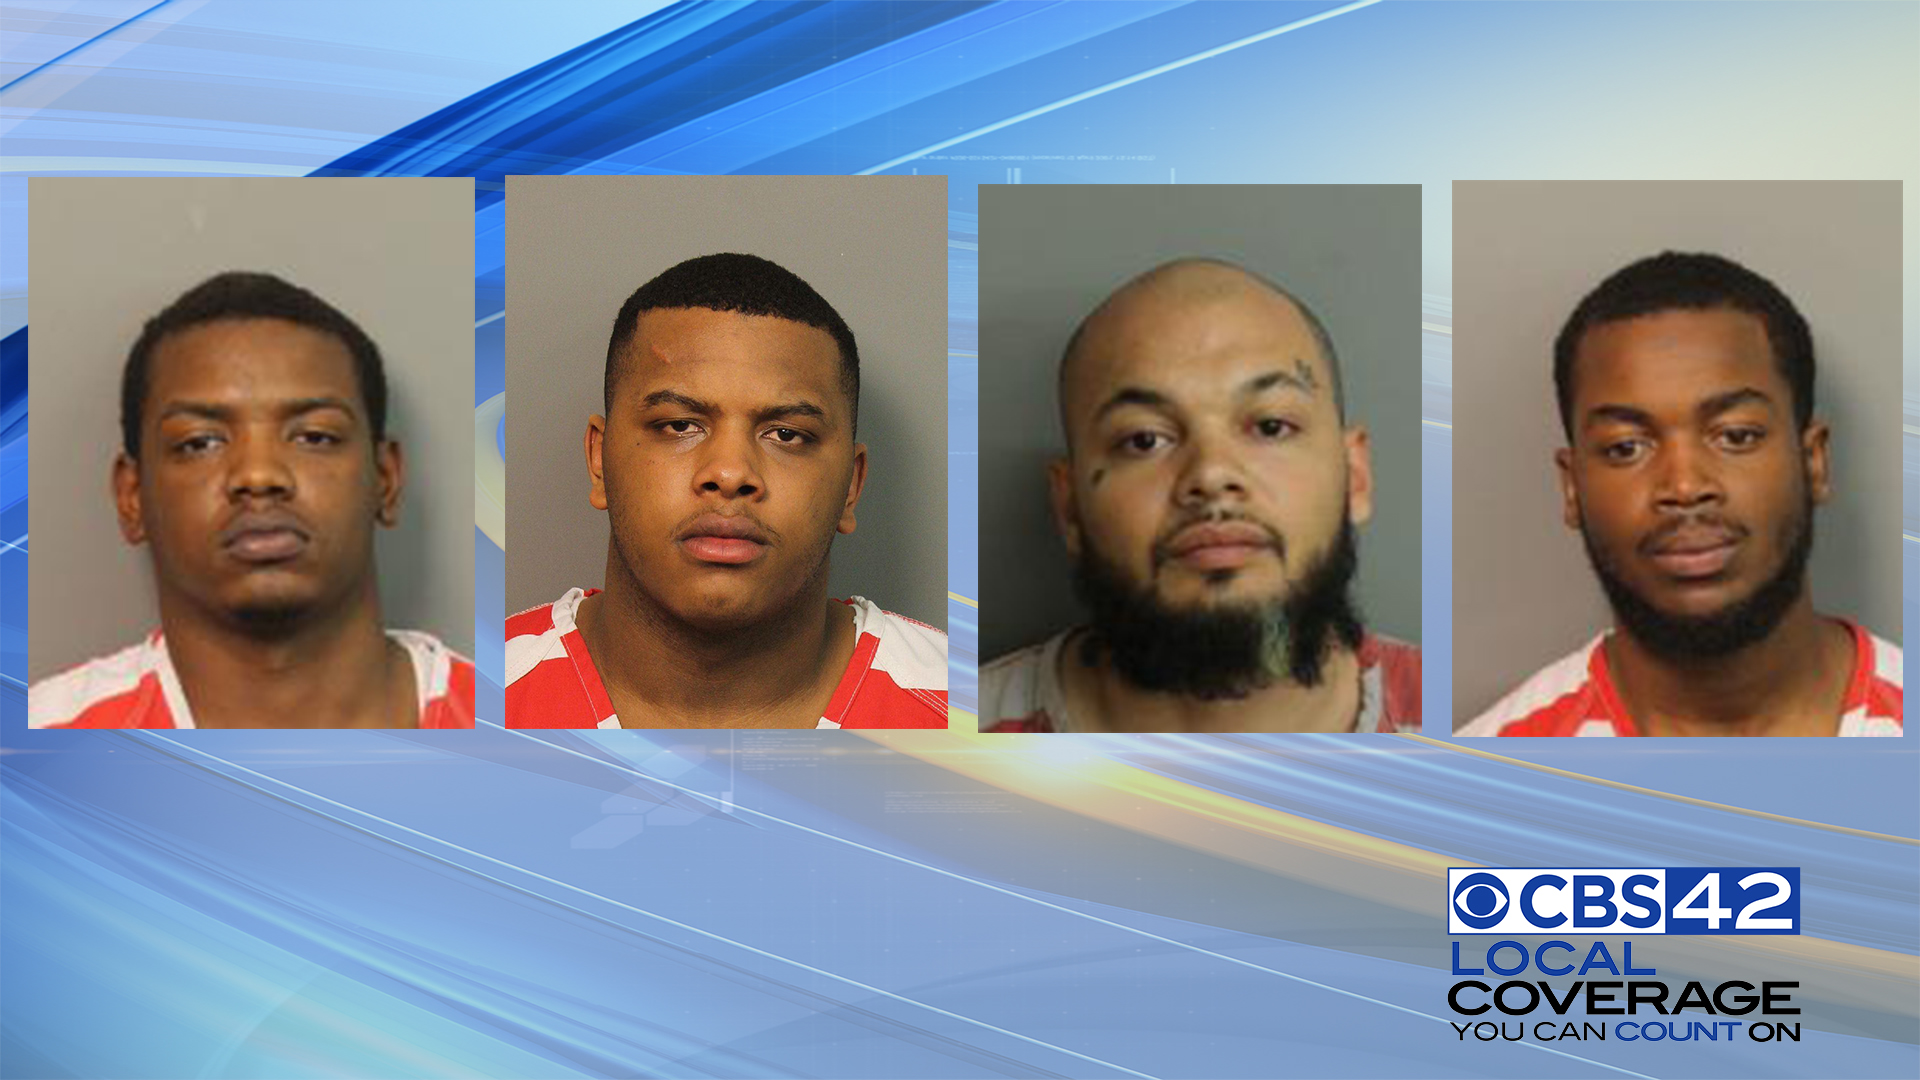 murder suspects lipscomb carlos gray aeriol barbee myzel arbuckle cortez johnson-clark jalen mcintyre_1525382175842.jpg.jpg